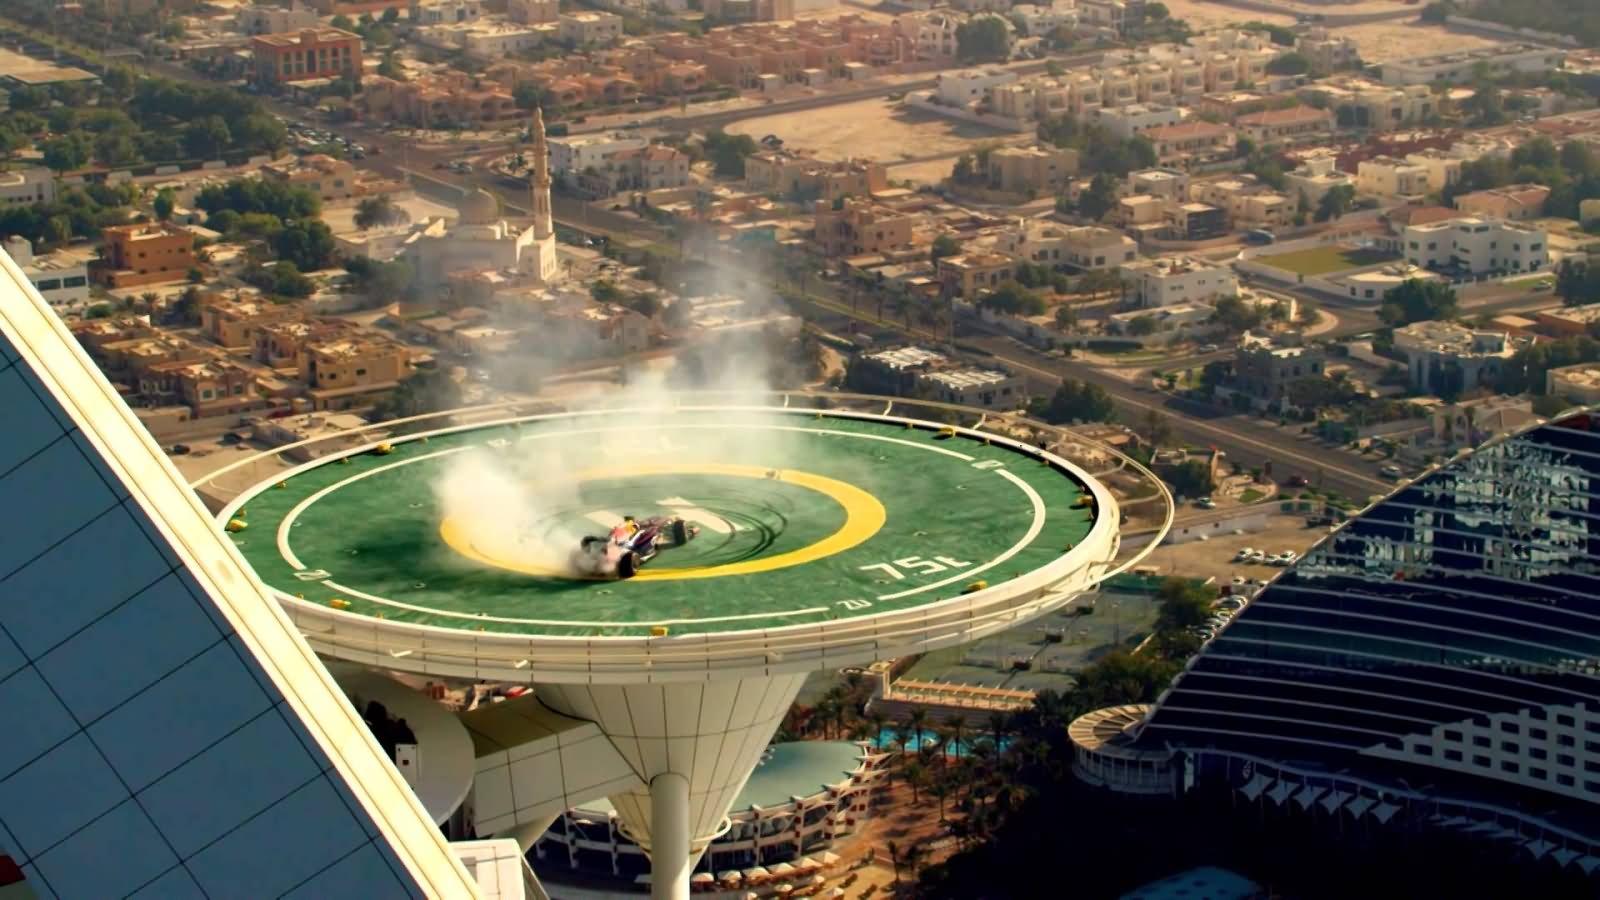 20 Very Beautiful Burj Al Arab Dubai Pictures And Images